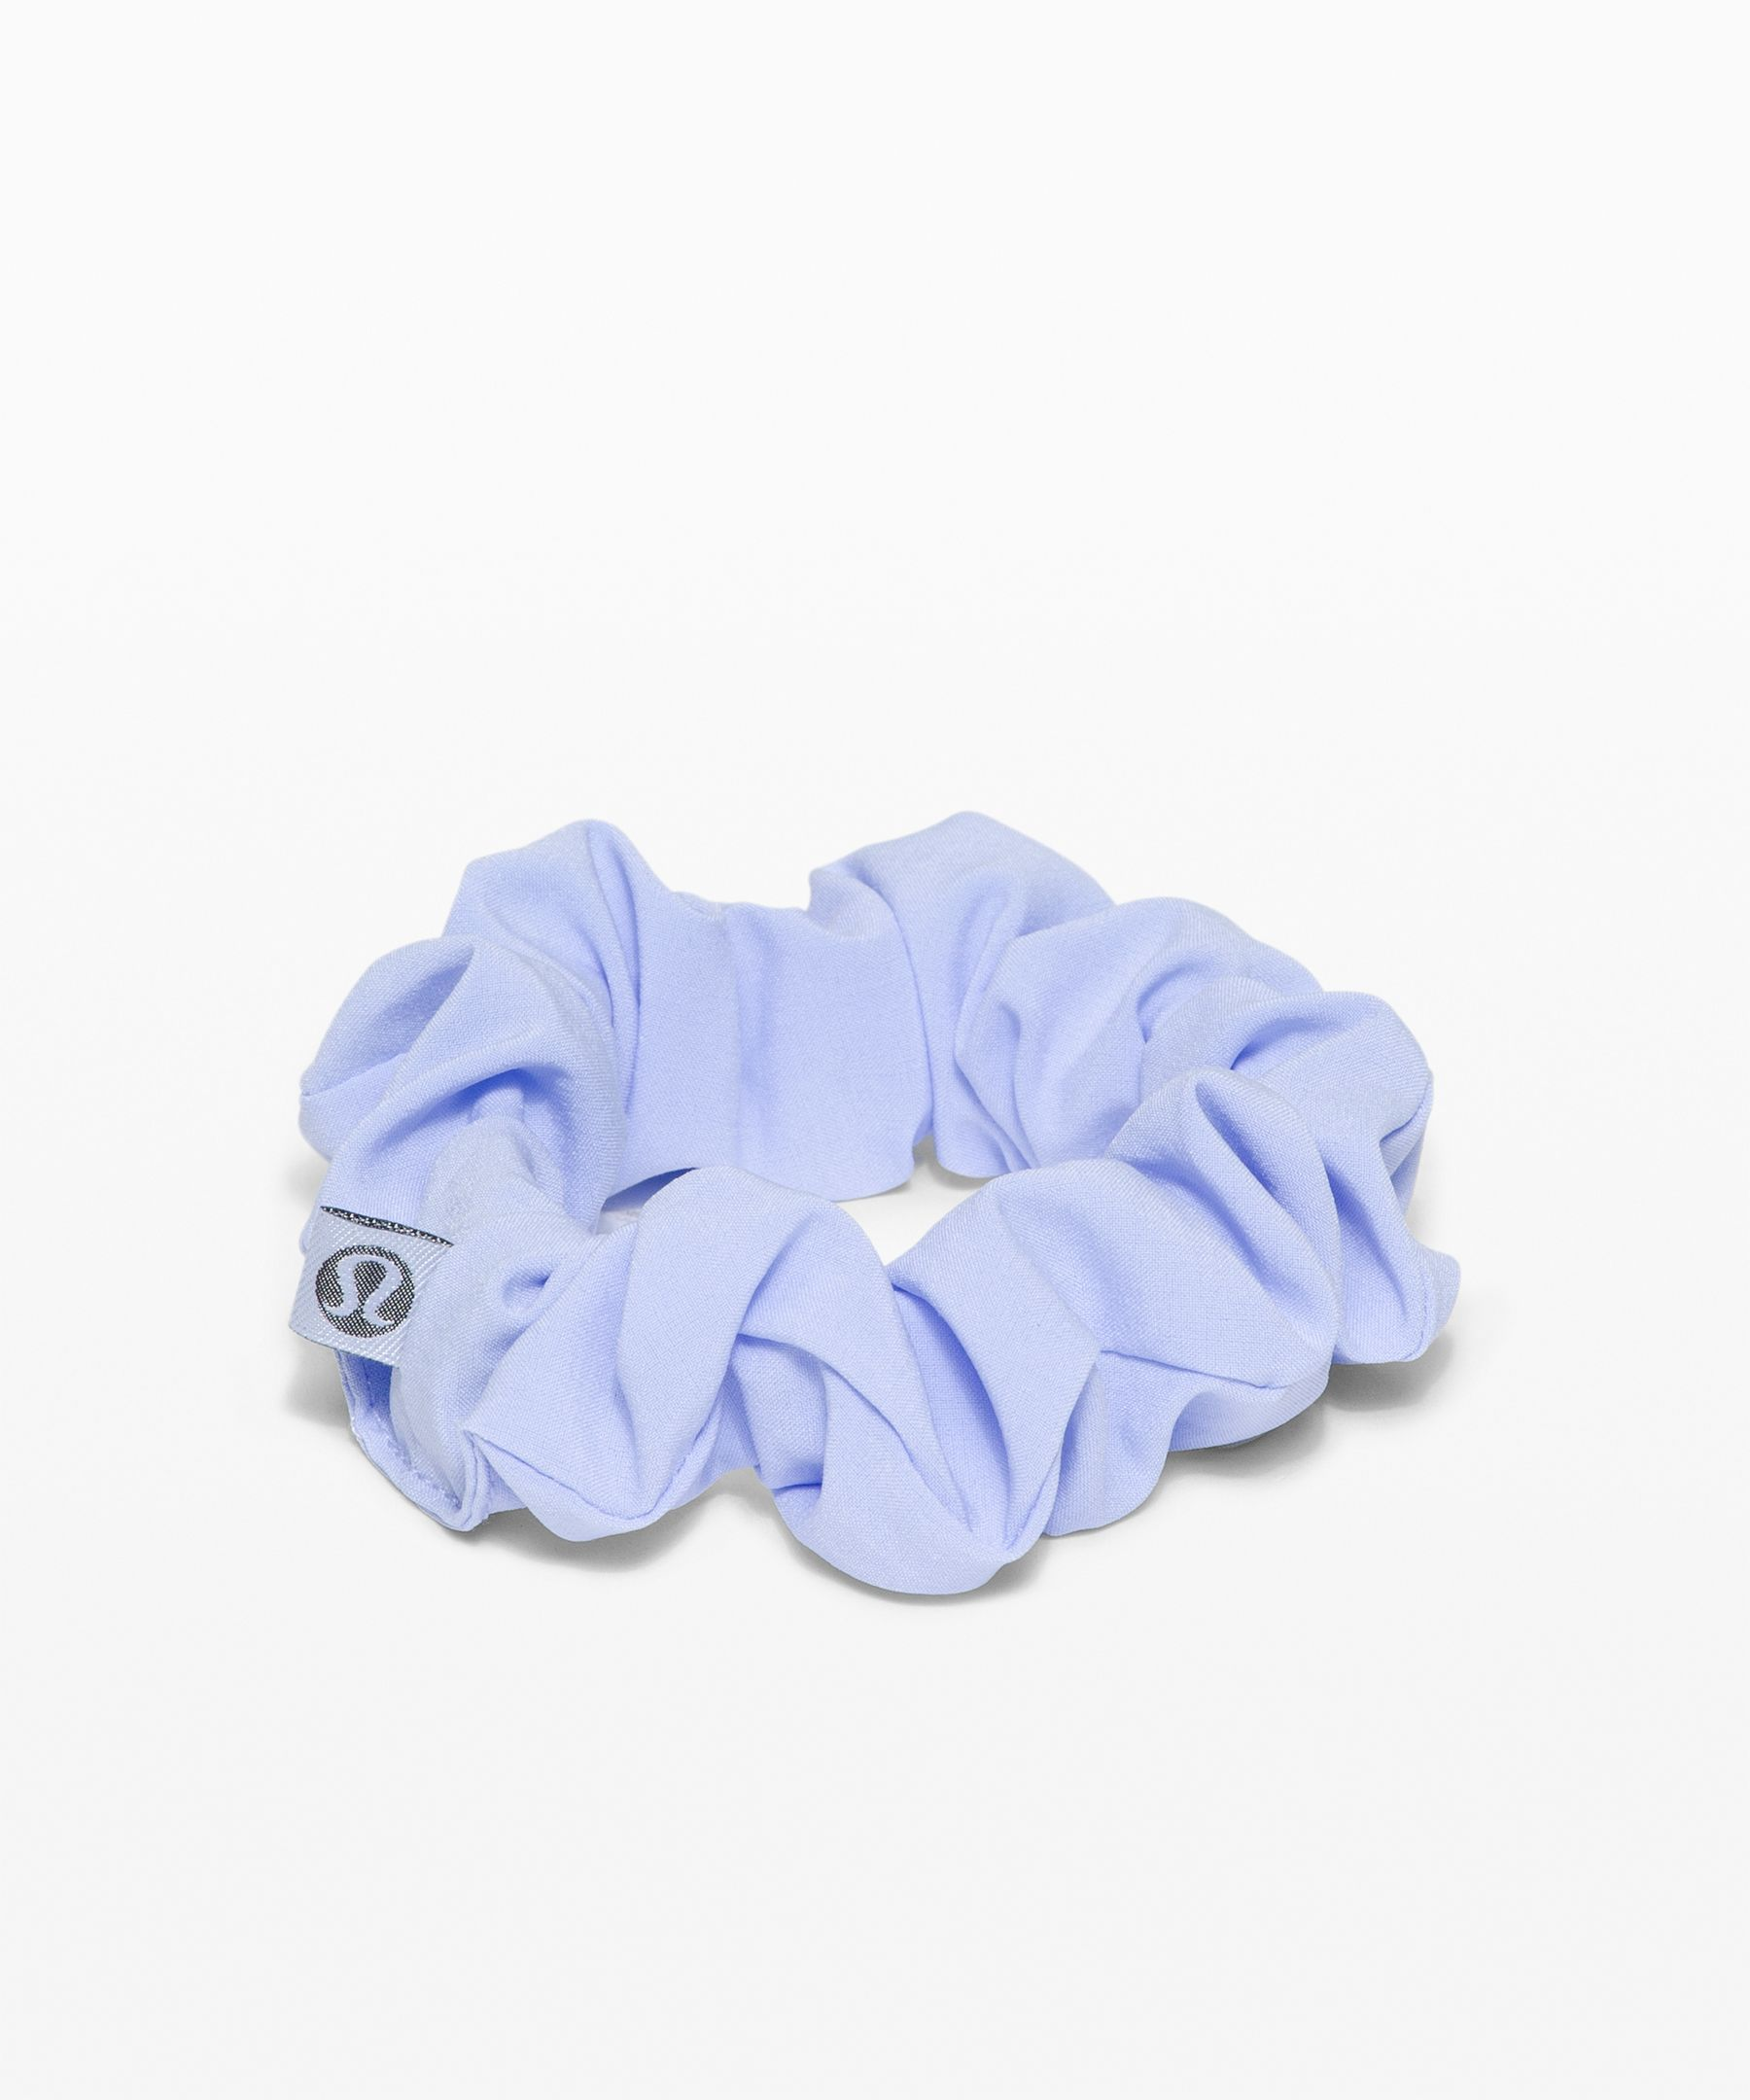 lululemon.com - Uplifting Scrunchie | Women's Accessories | lululemon